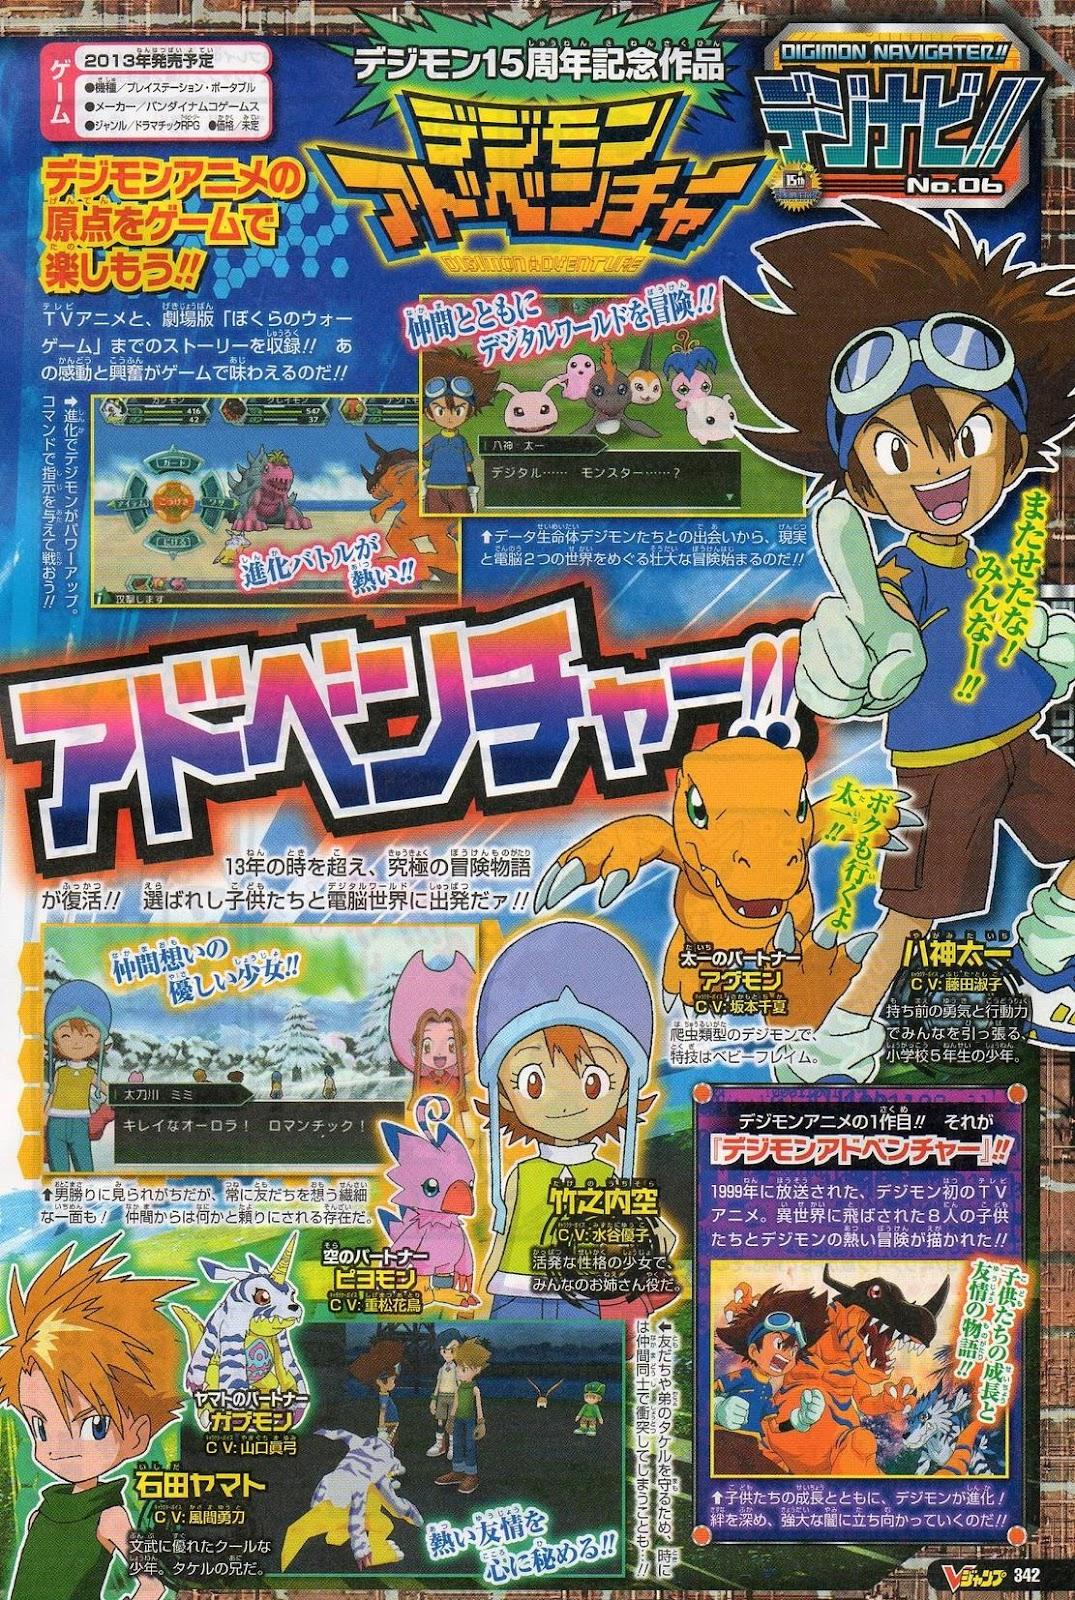 [V-Jump 11/2012] Digimon Crusaders + Digimon Adventure PSP V-JUMP+NOVEMBRO+Digimon+Adventure+PSP